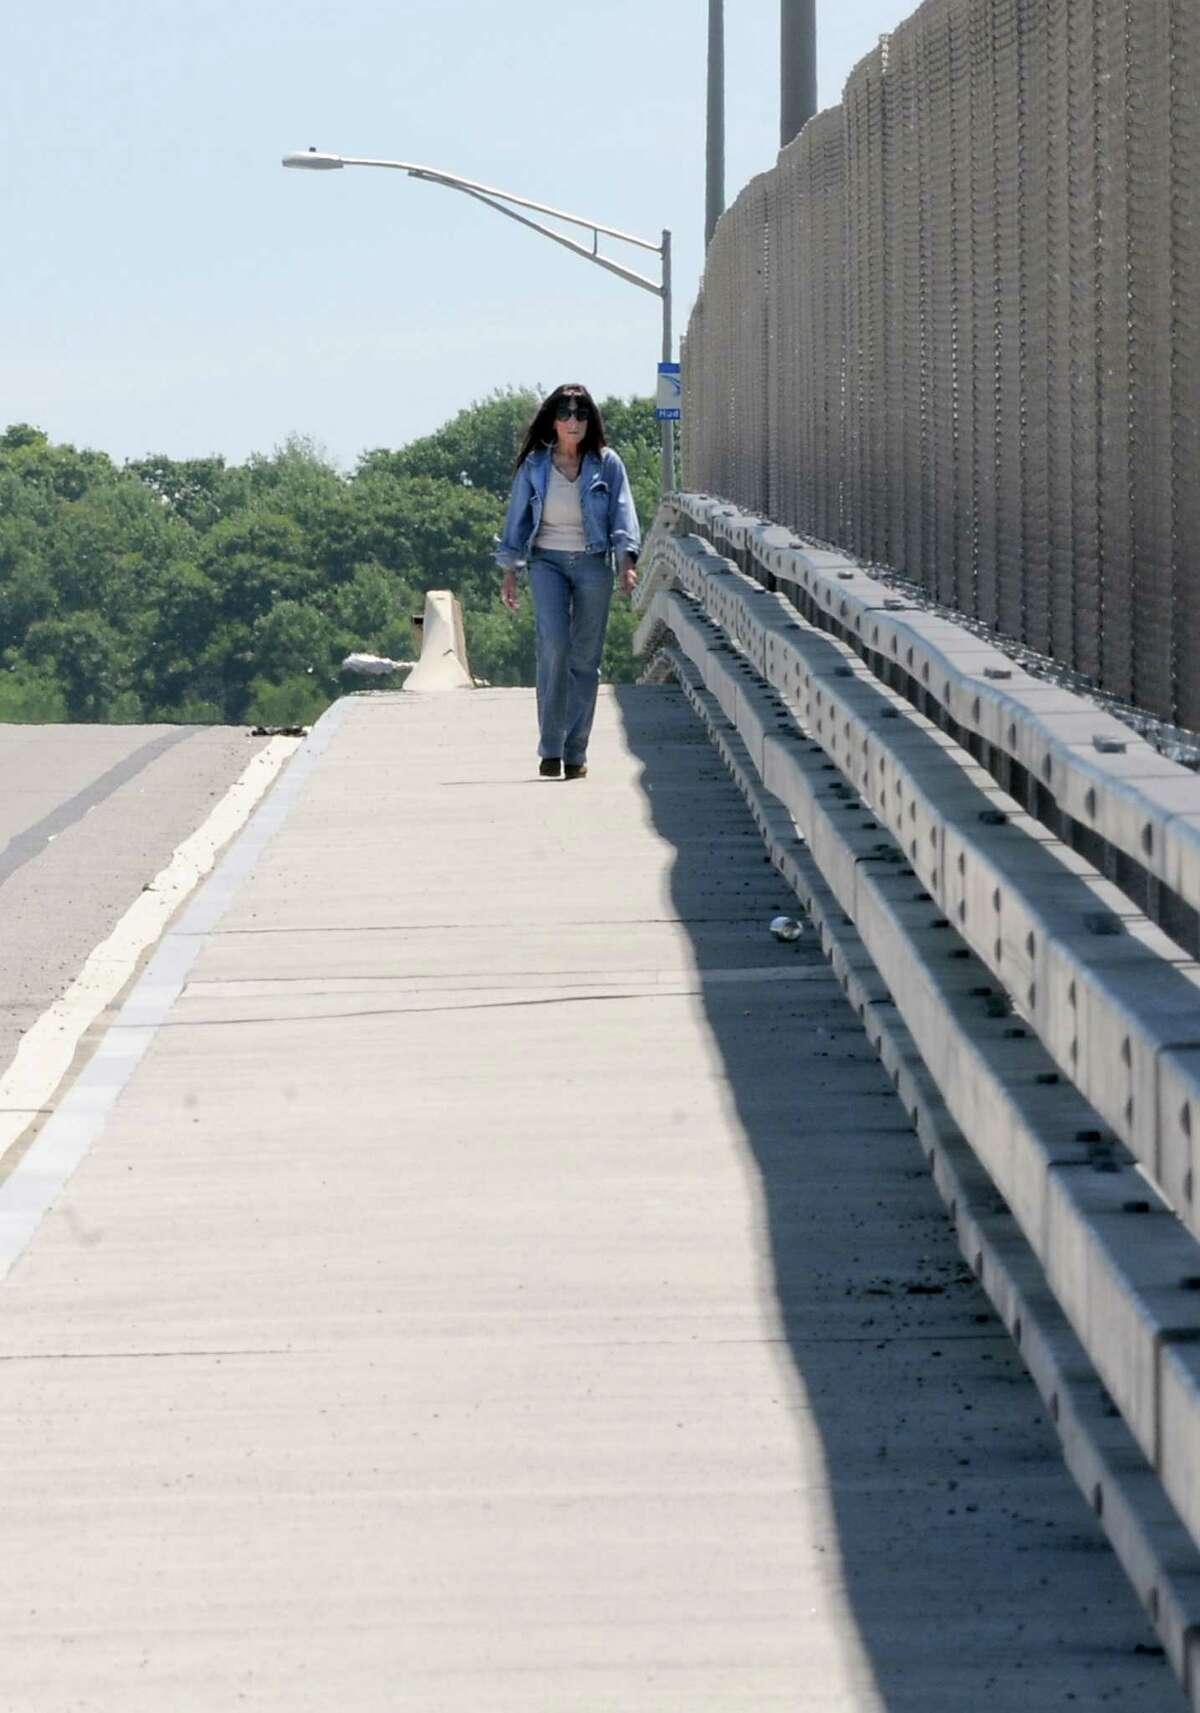 A pedestrian walks on the Congress Street bridge on Wednesday, June 5, 2013 in Troy N.Y. (Lori Van Buren / Times Union)